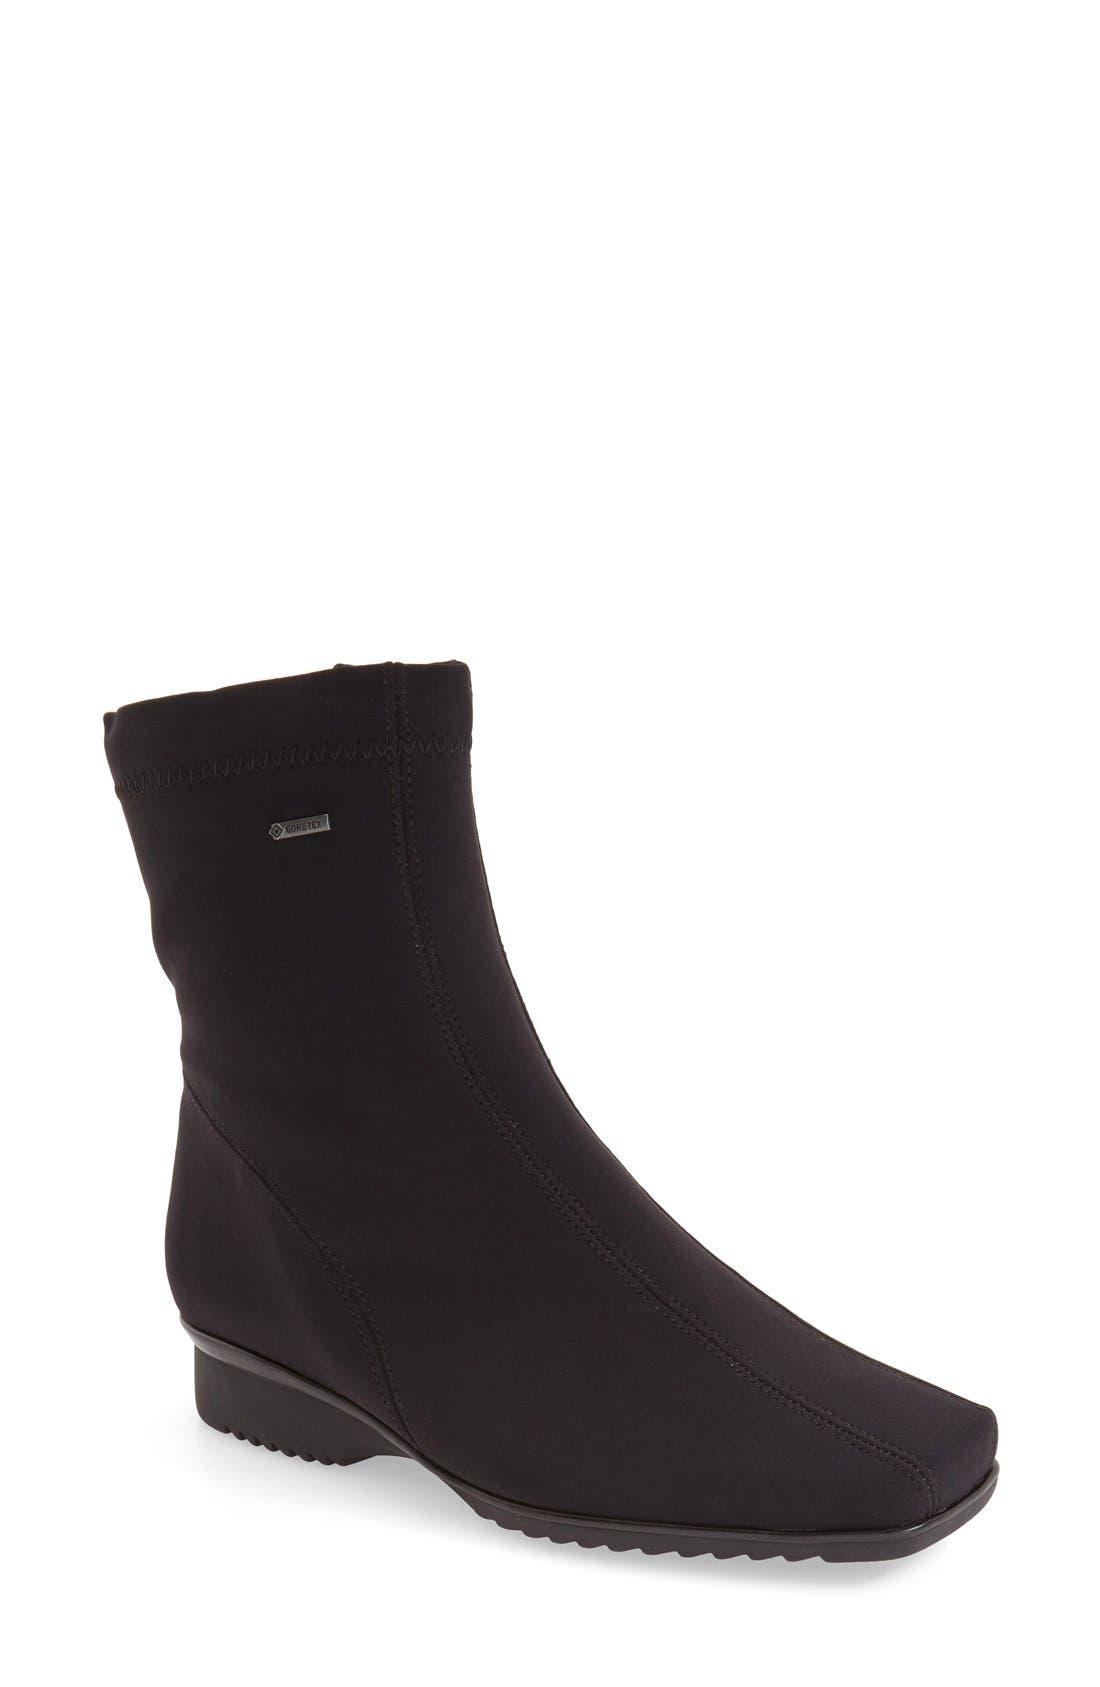 245c6d552f3d90 Women s Ara Shoes